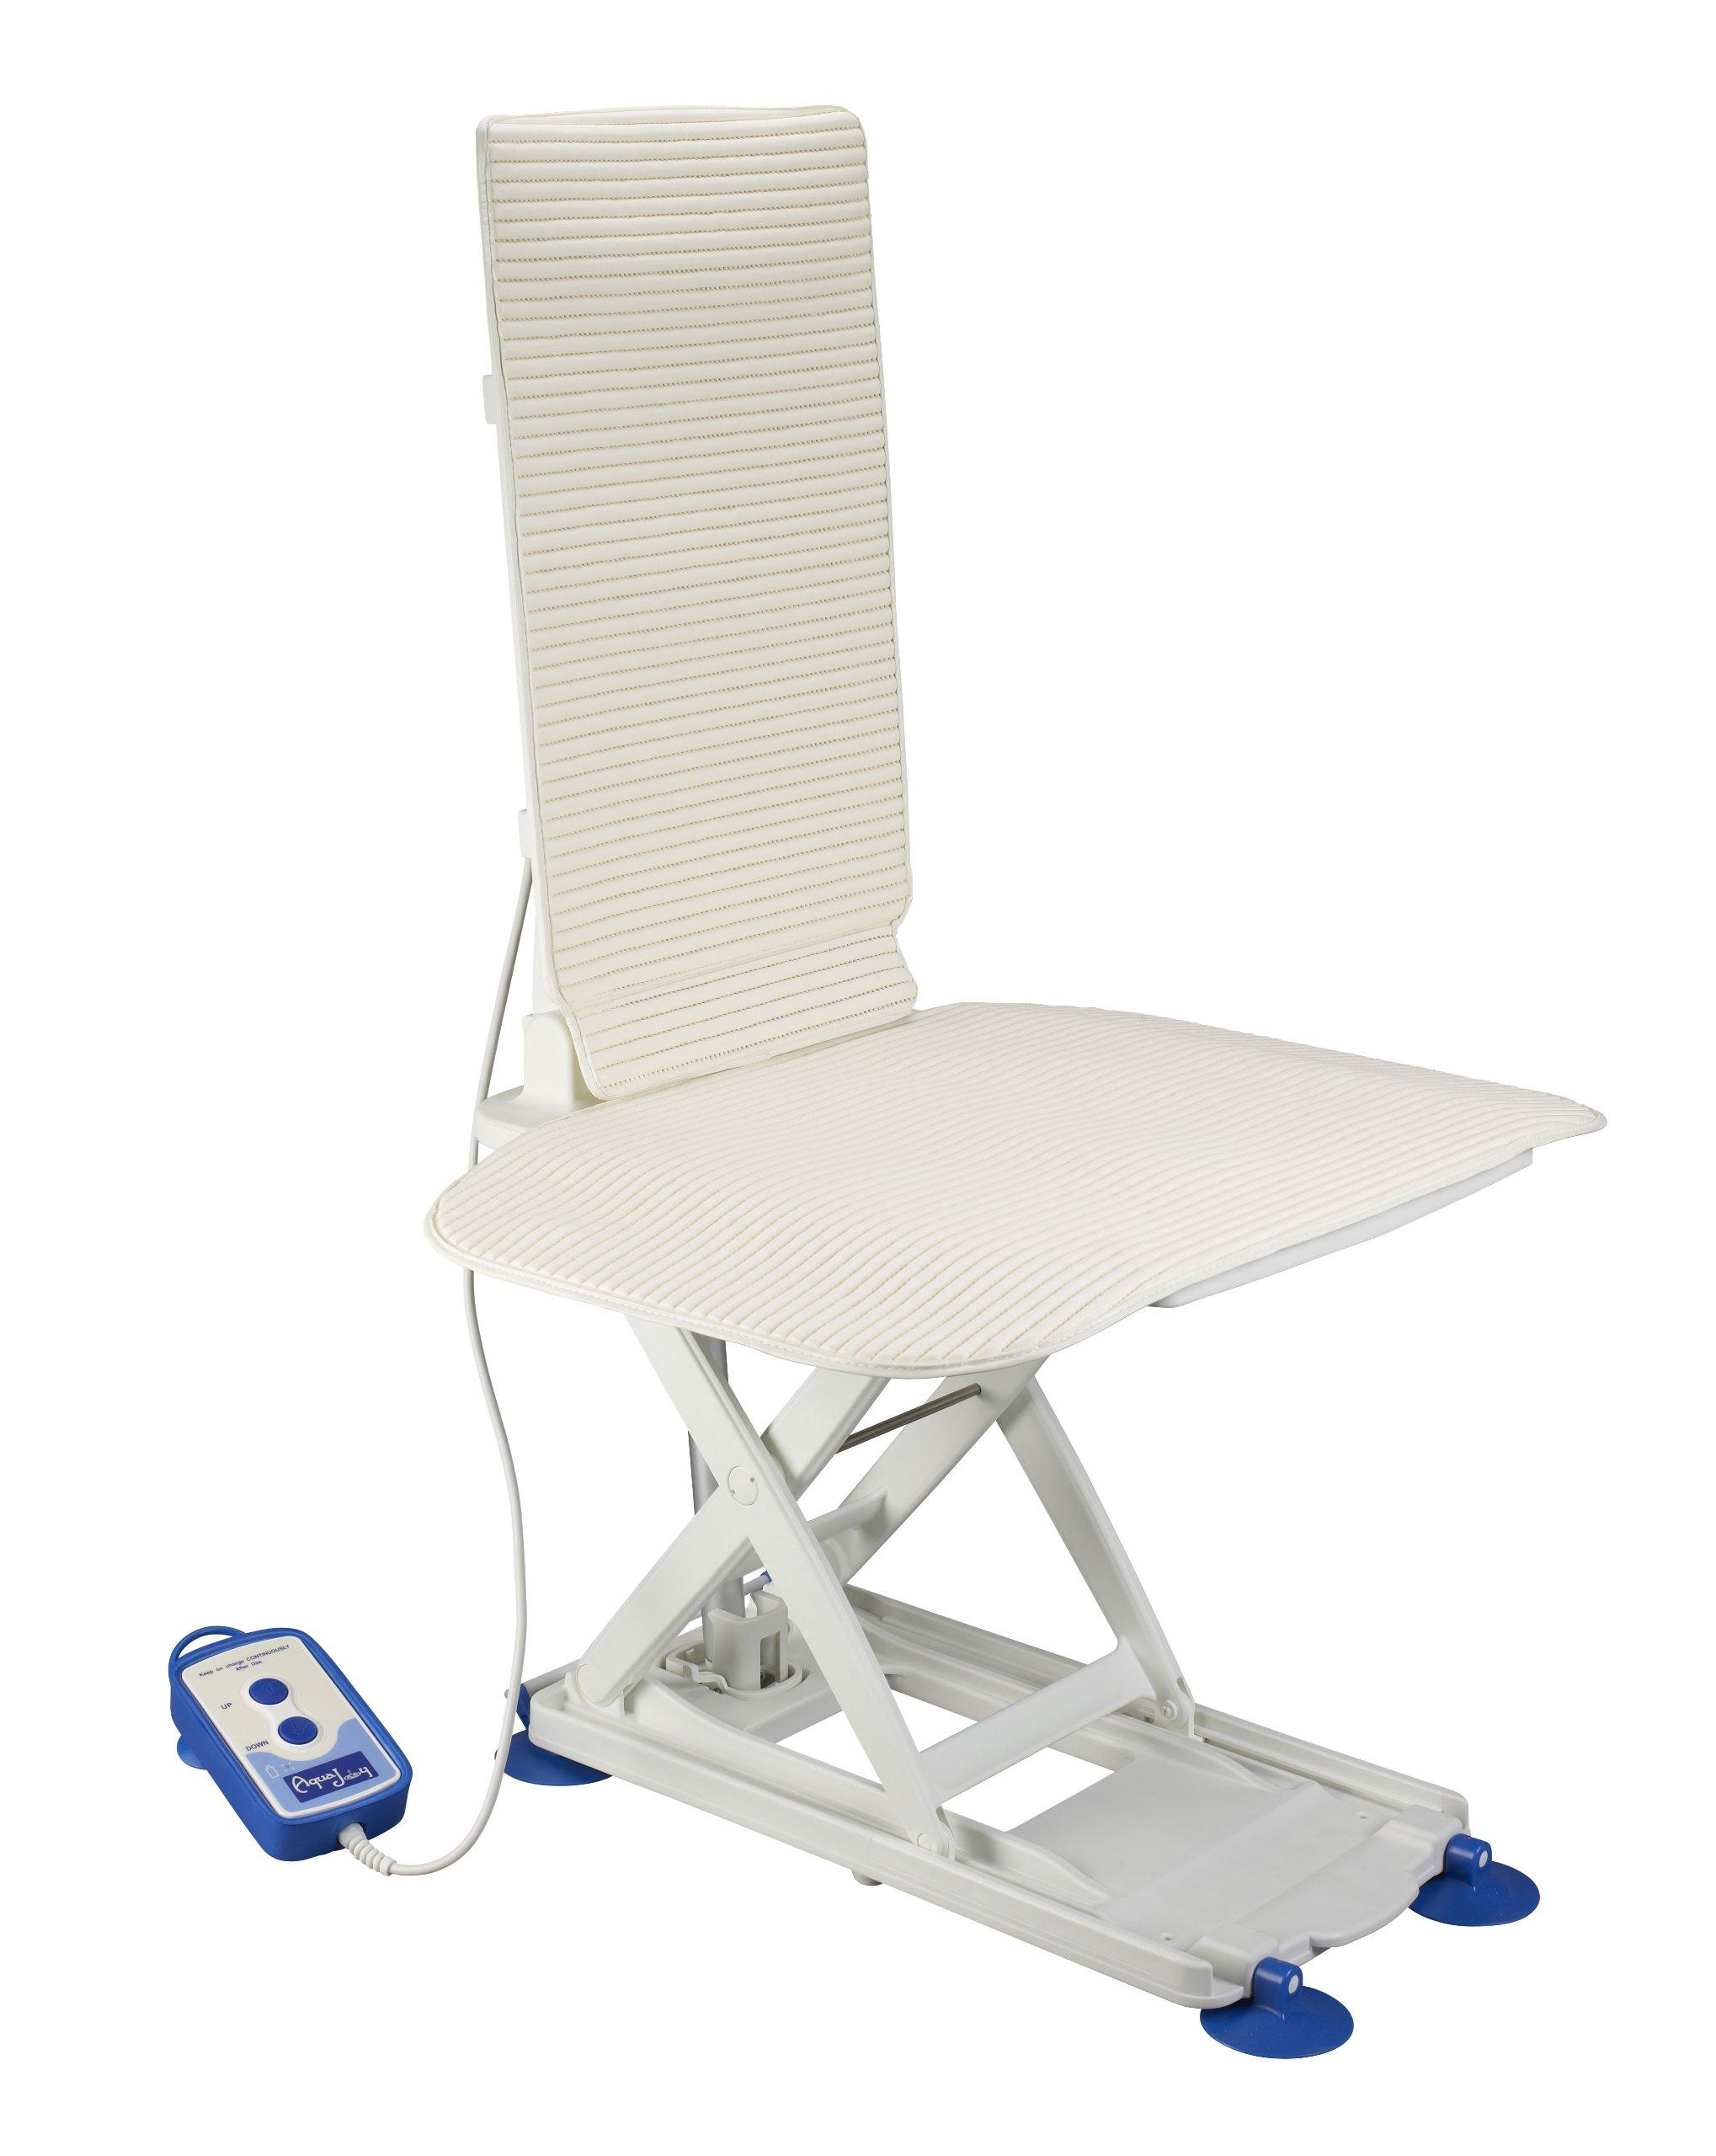 Drive Medical Aquajoy Premier Plus Reclining Bathlift, White